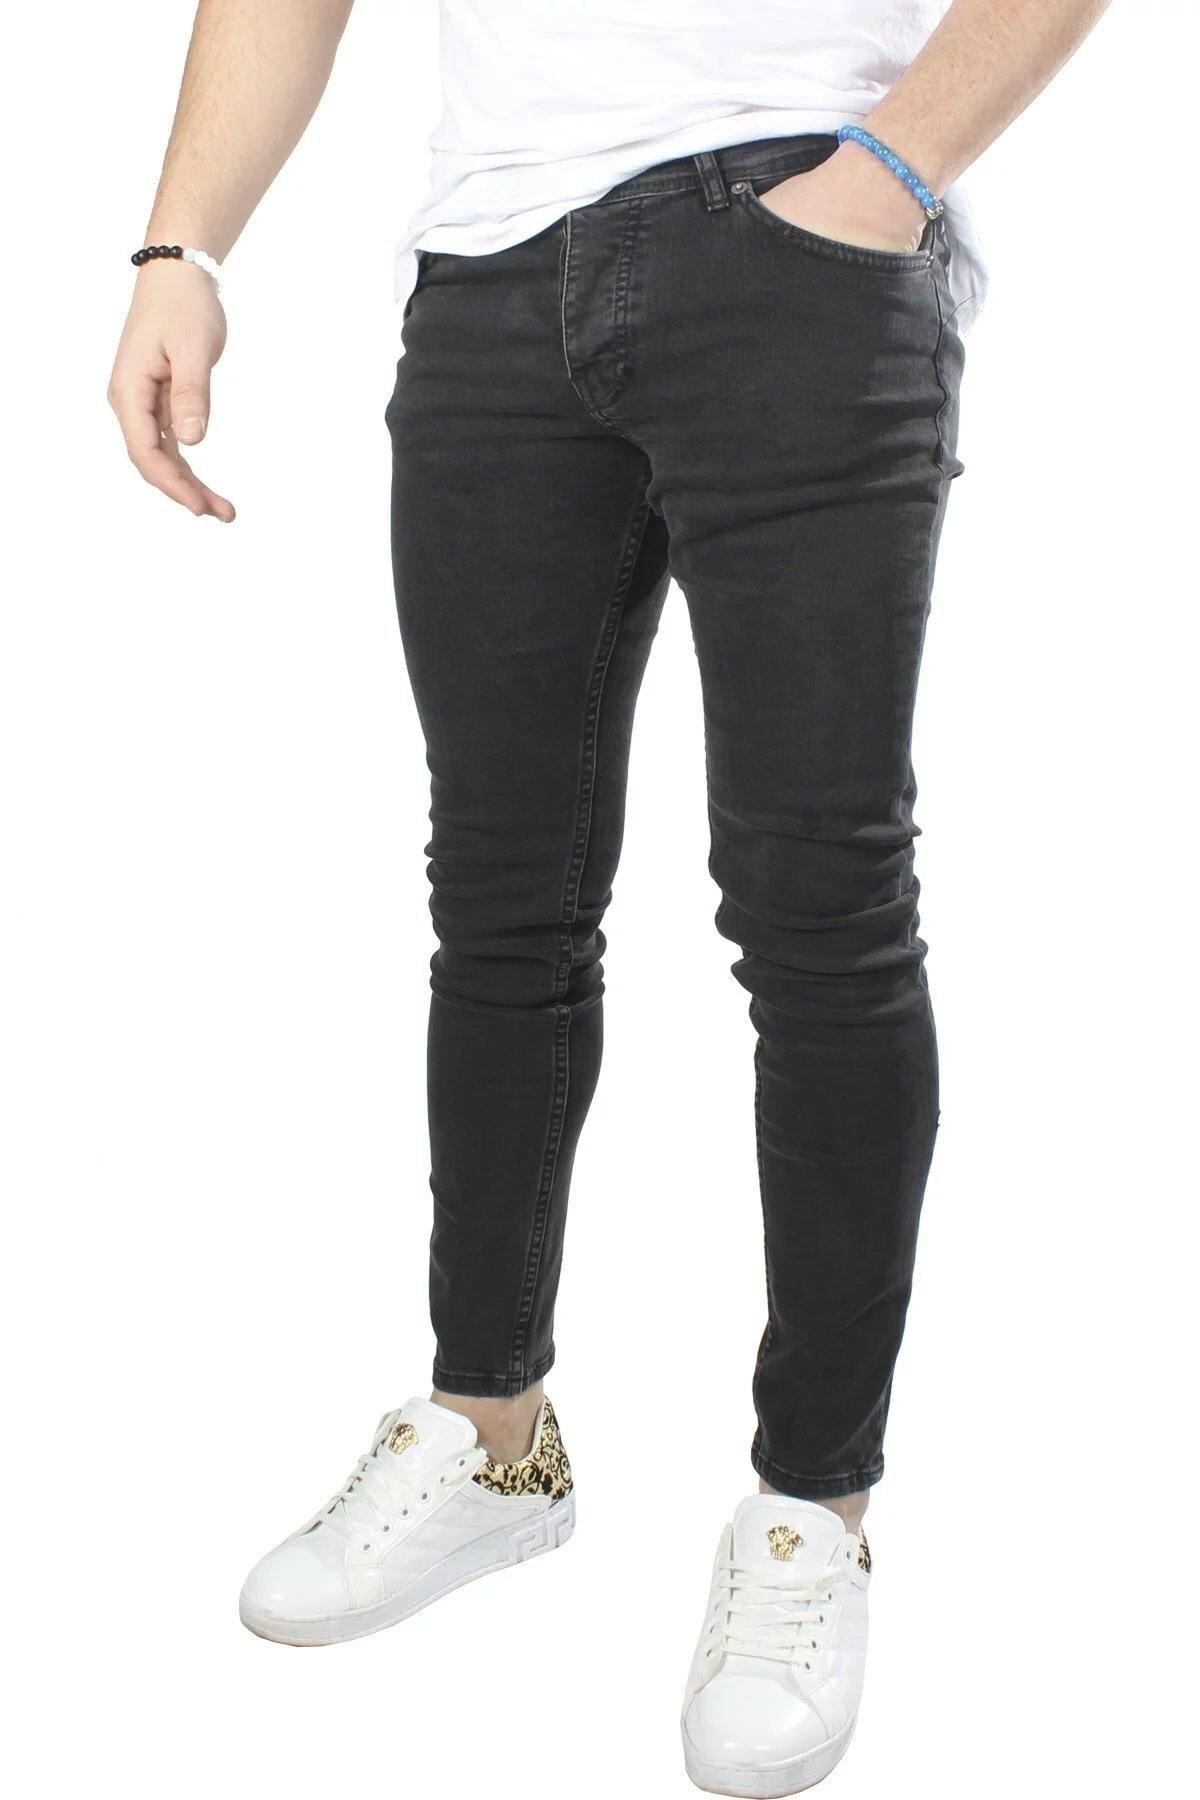 Terapi Men Erkek Kot Pantolon 9K-2100342-035 Füme